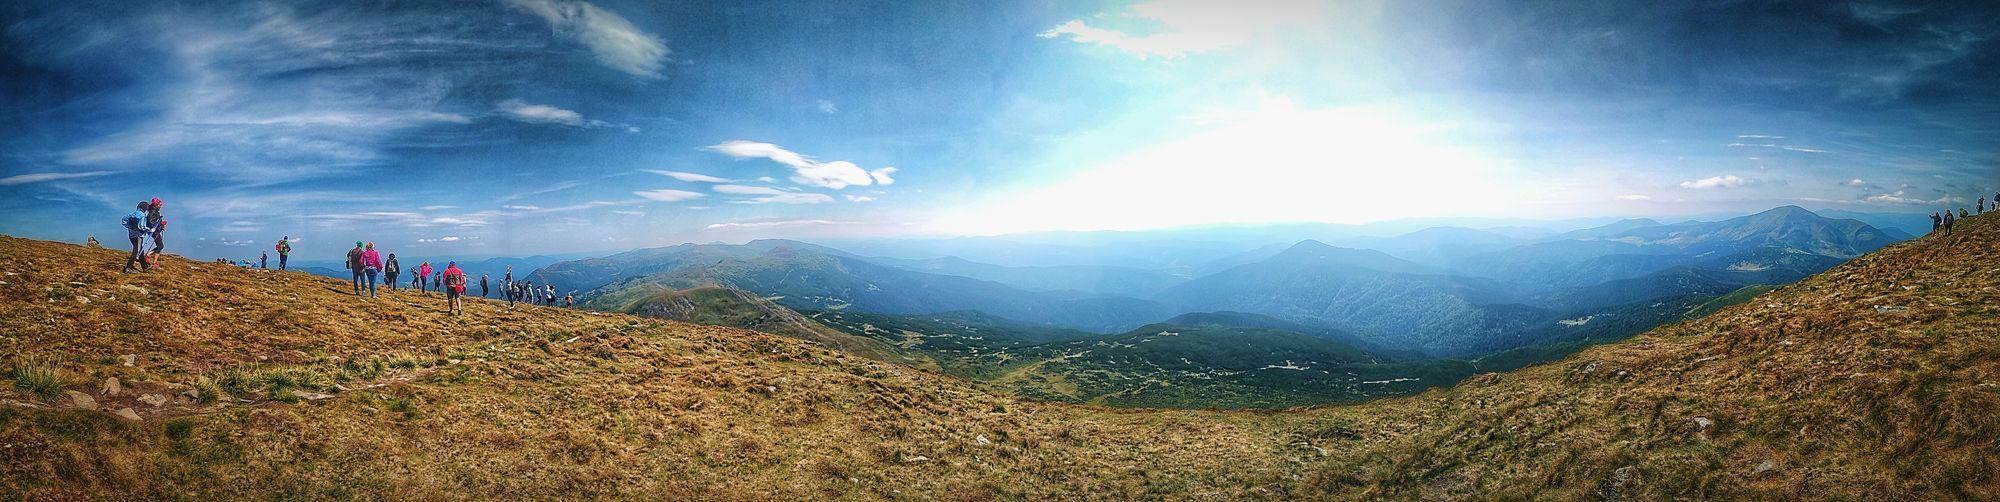 Carpathian Mountains, Summer Day, Ukraine 💙💛, Phone Photo, Panorama, 2017